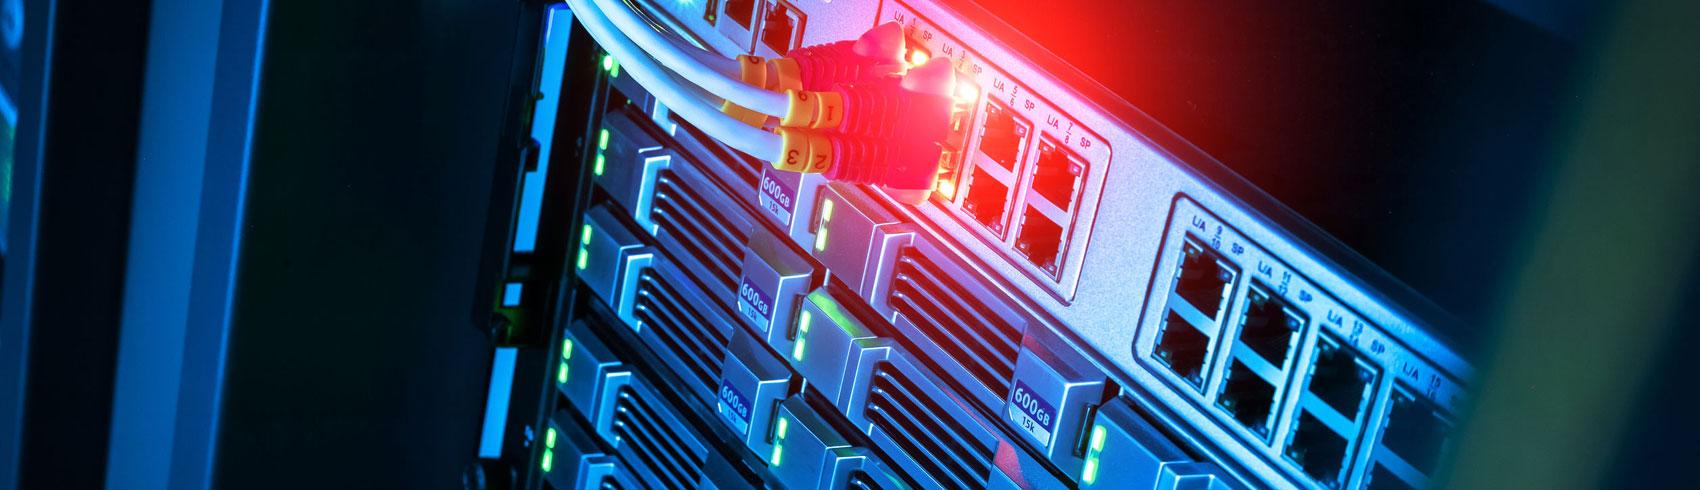 Flagship Technologies | Refurbished Servers, Used Servers